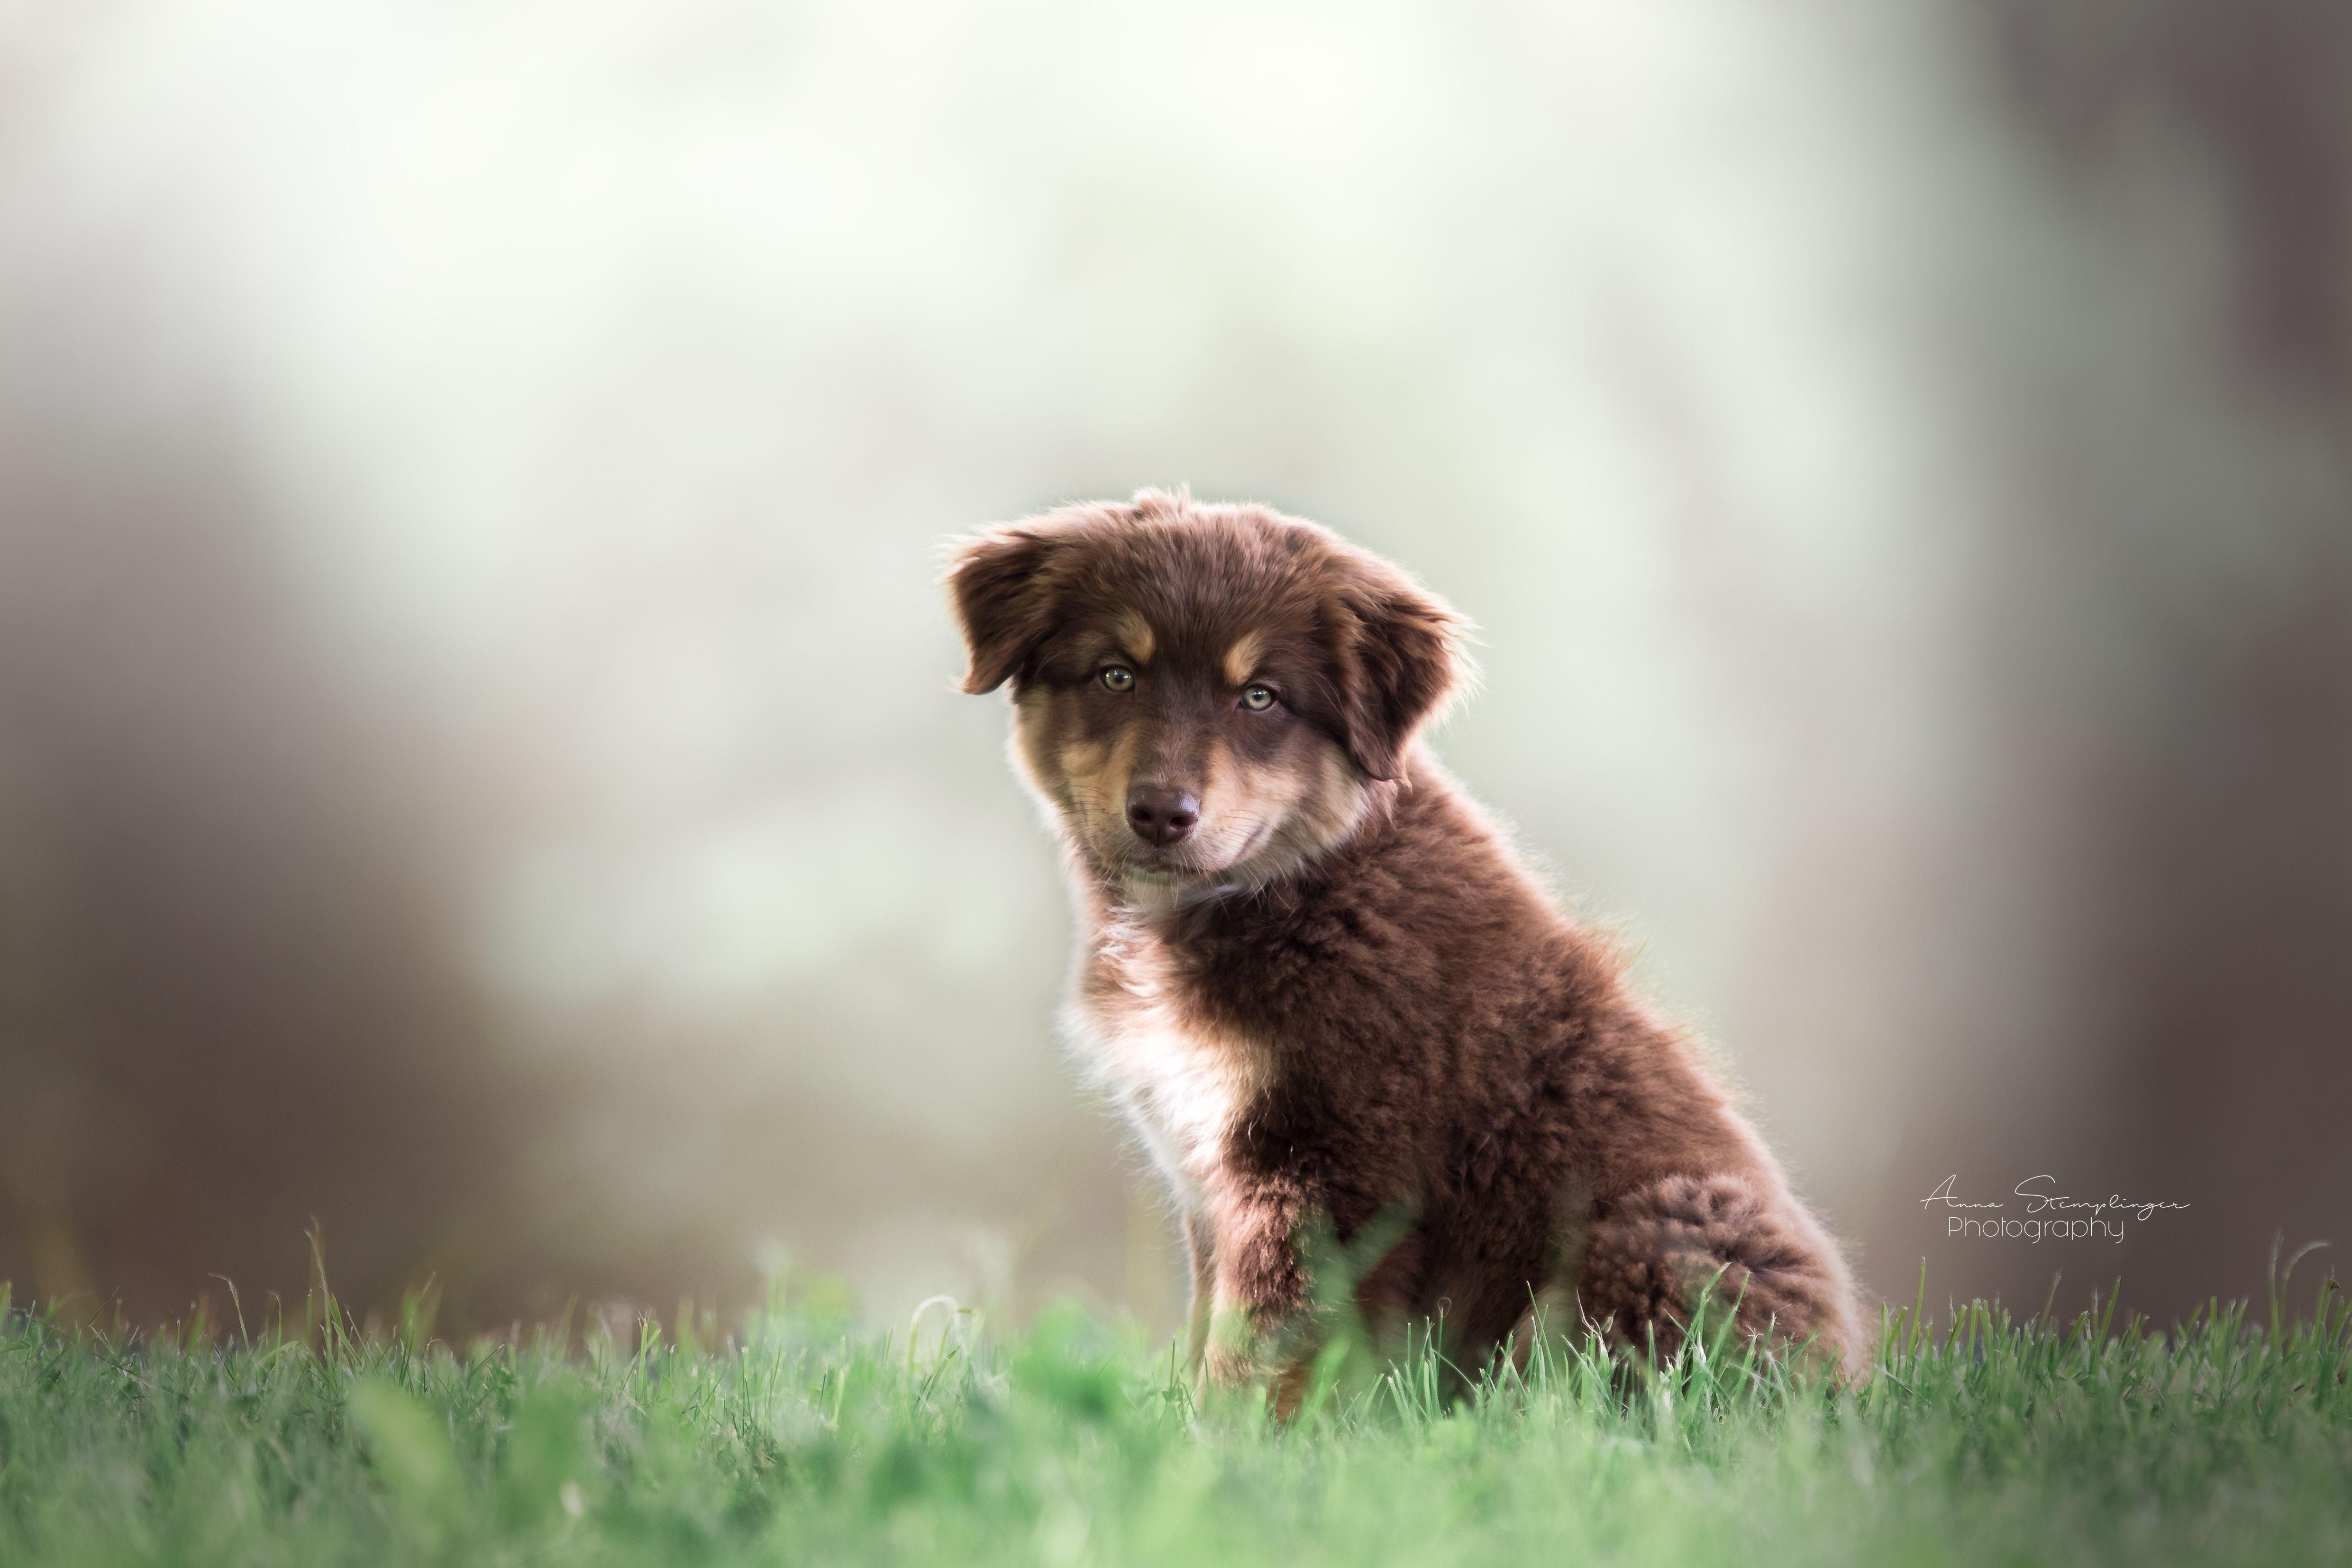 Australien Sheperd Welpe Hundefotografie Tierfotografie Bayern Niederbayern Landshut Hundefotografie